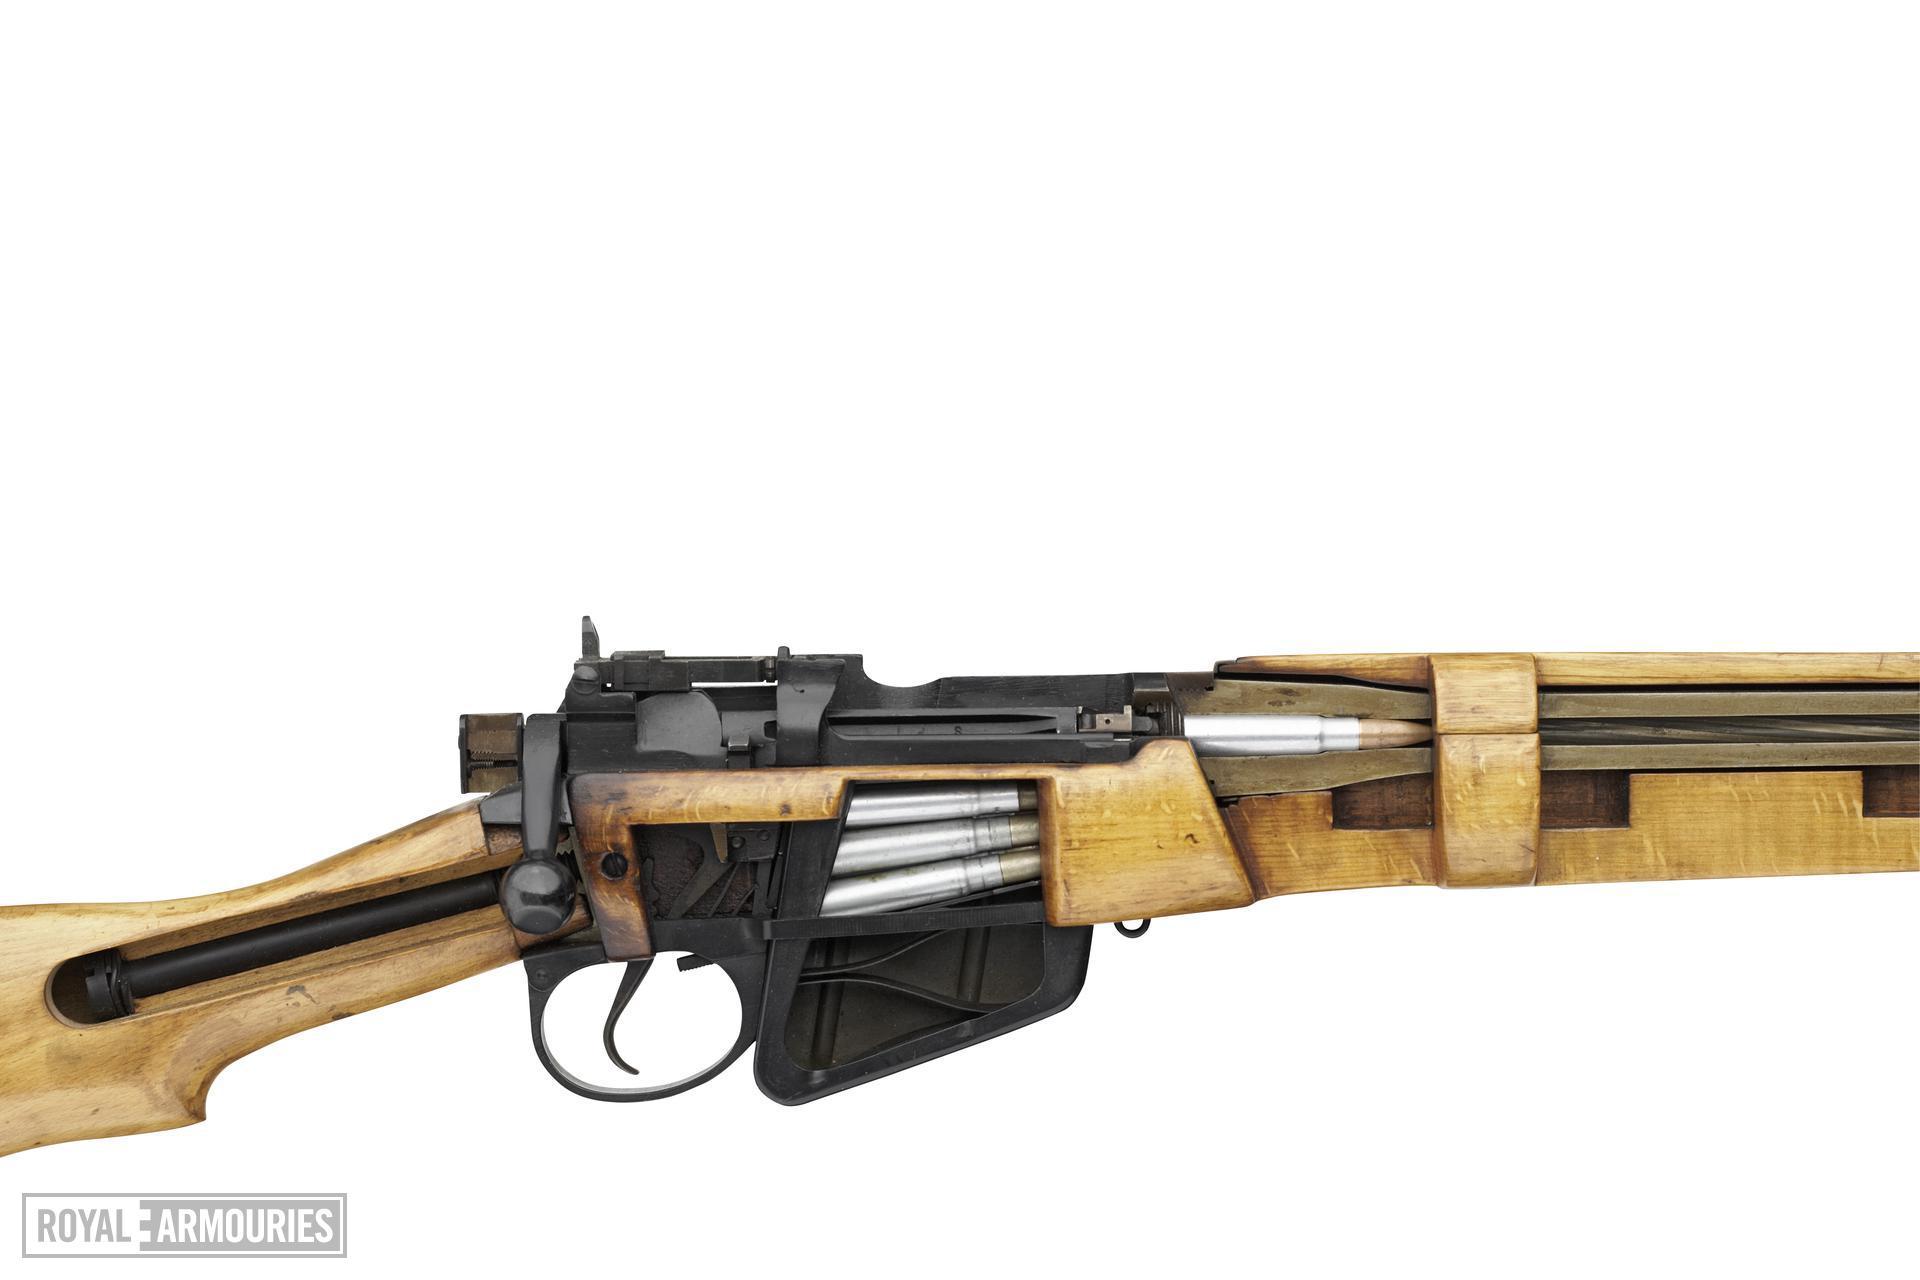 Centrefire bolt-action military skeleton rifle - Lee-Enfield No.4 Mk.I/II Skeleton